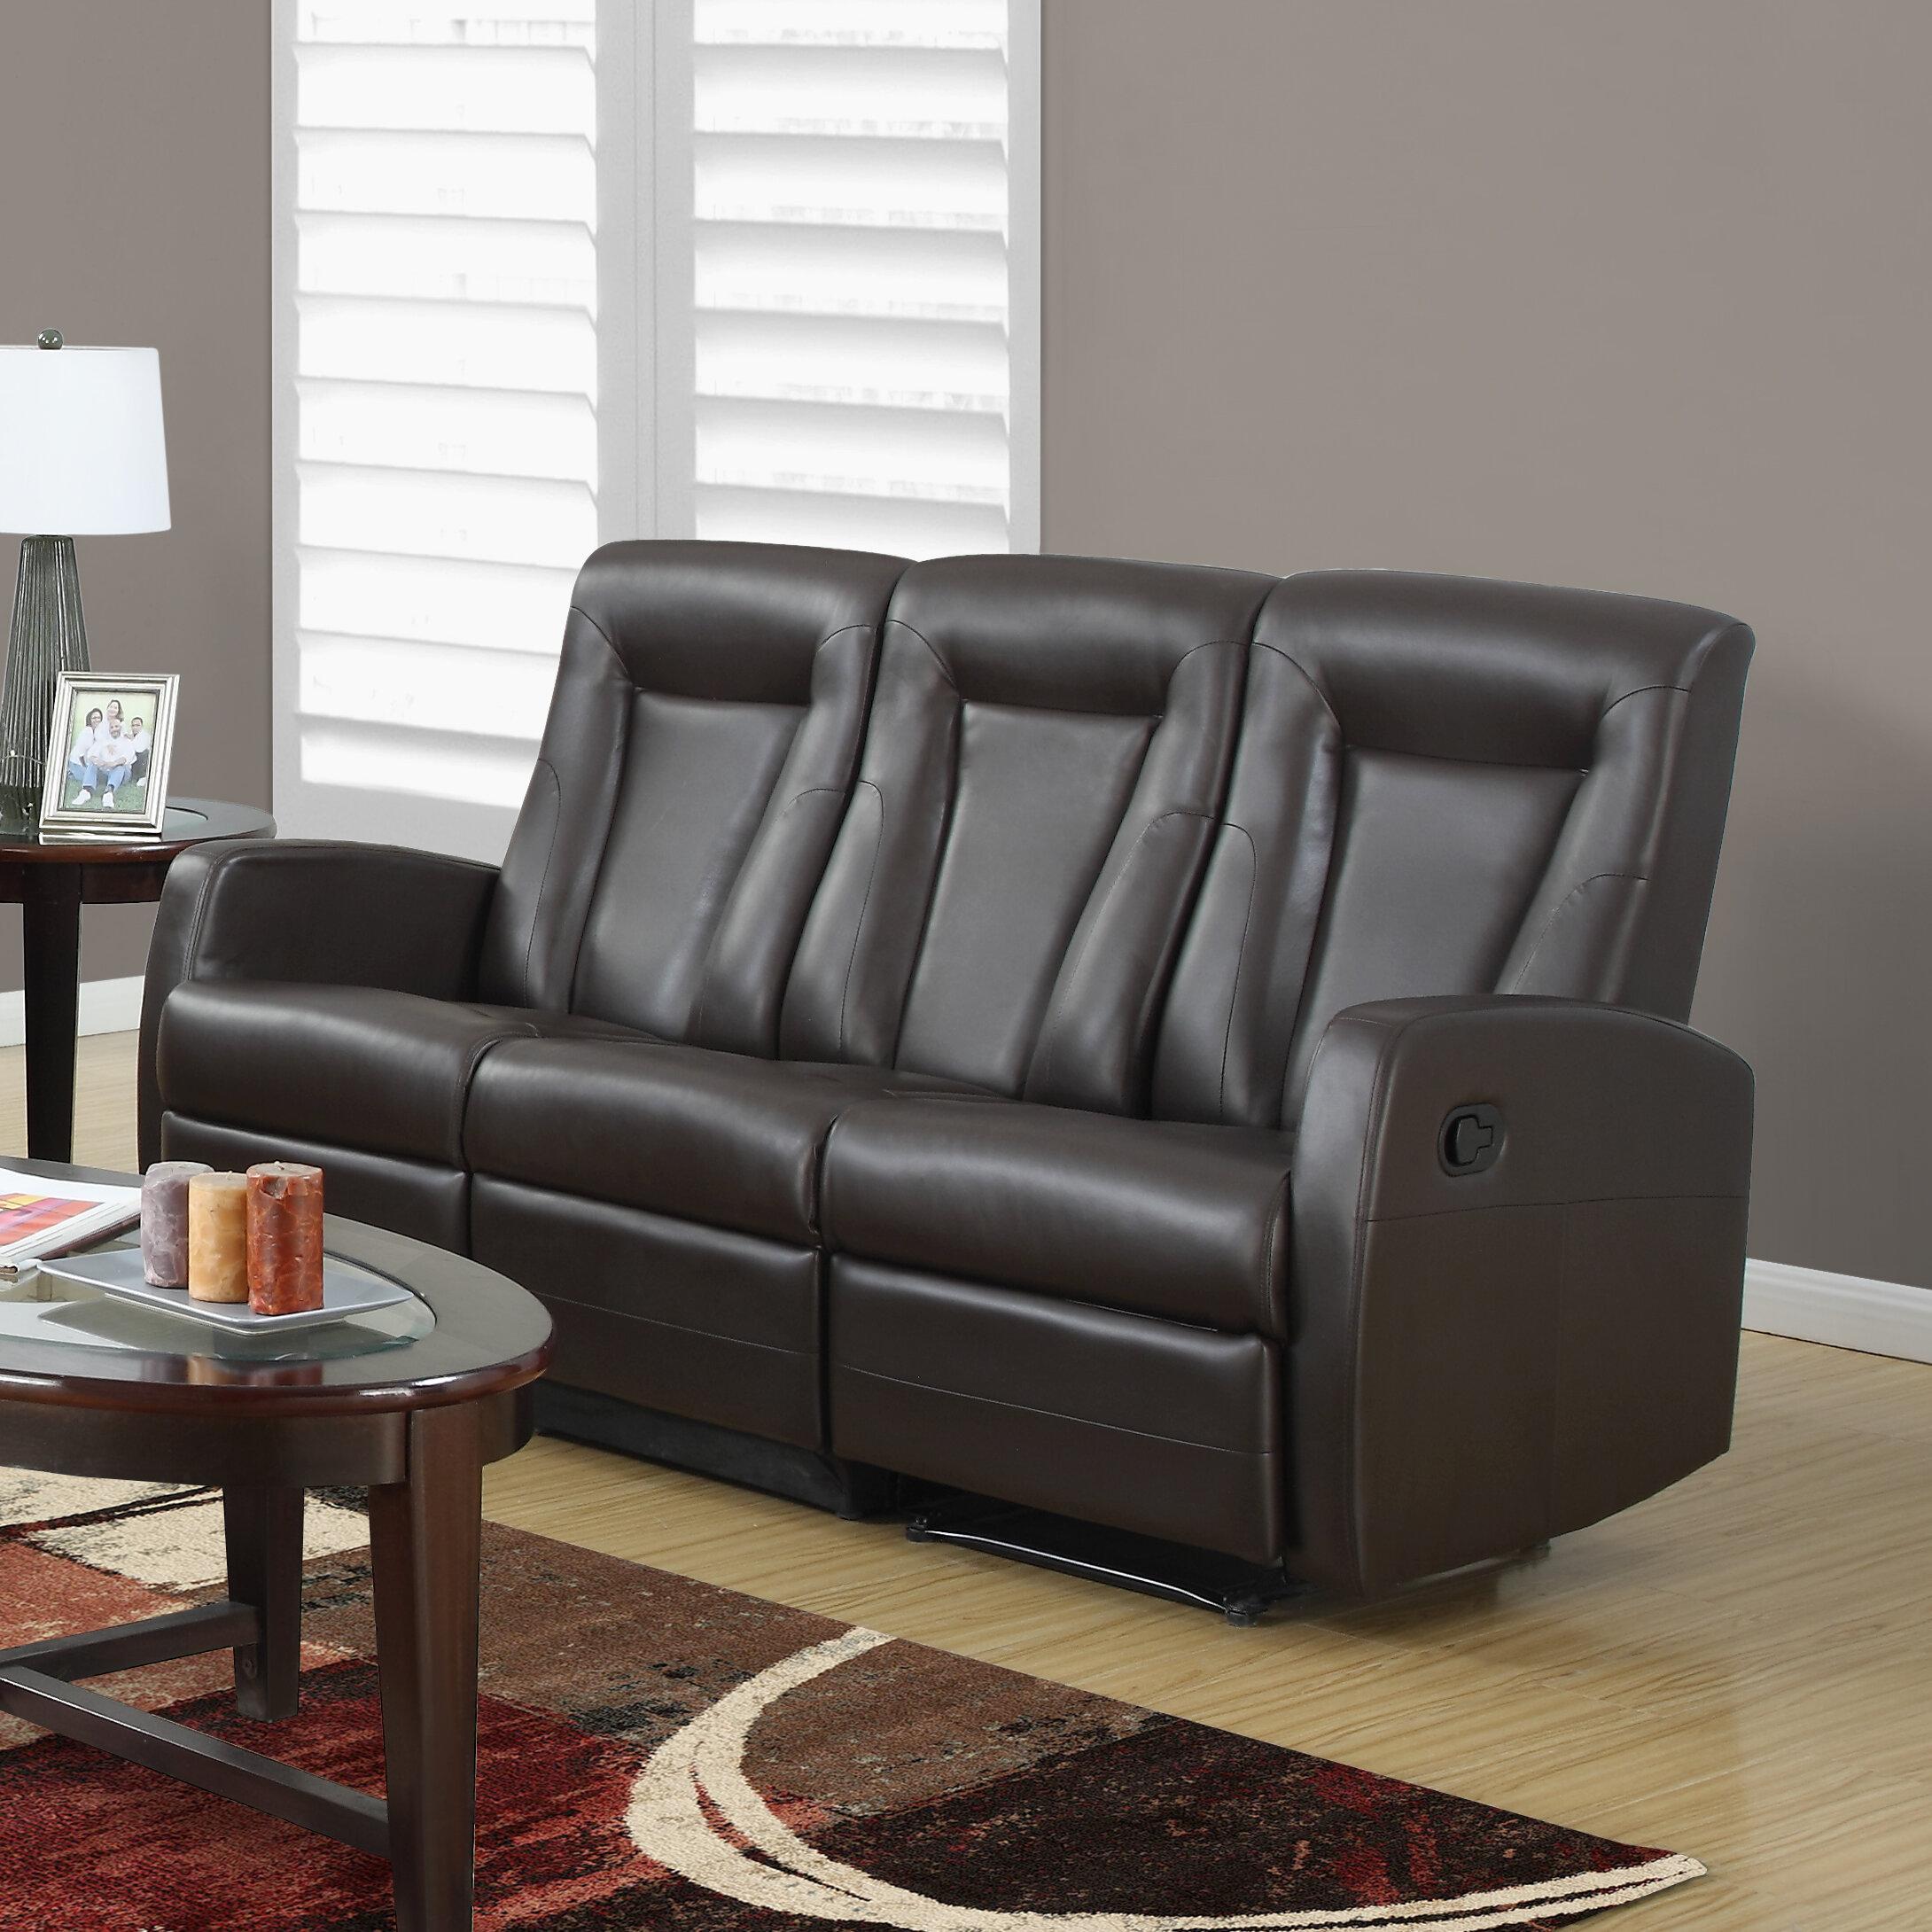 monarch specialties inc bonded leather reclining sofa reviews rh wayfair com elran bonded leather reclining sofa norwich bonded leather reclining sofa